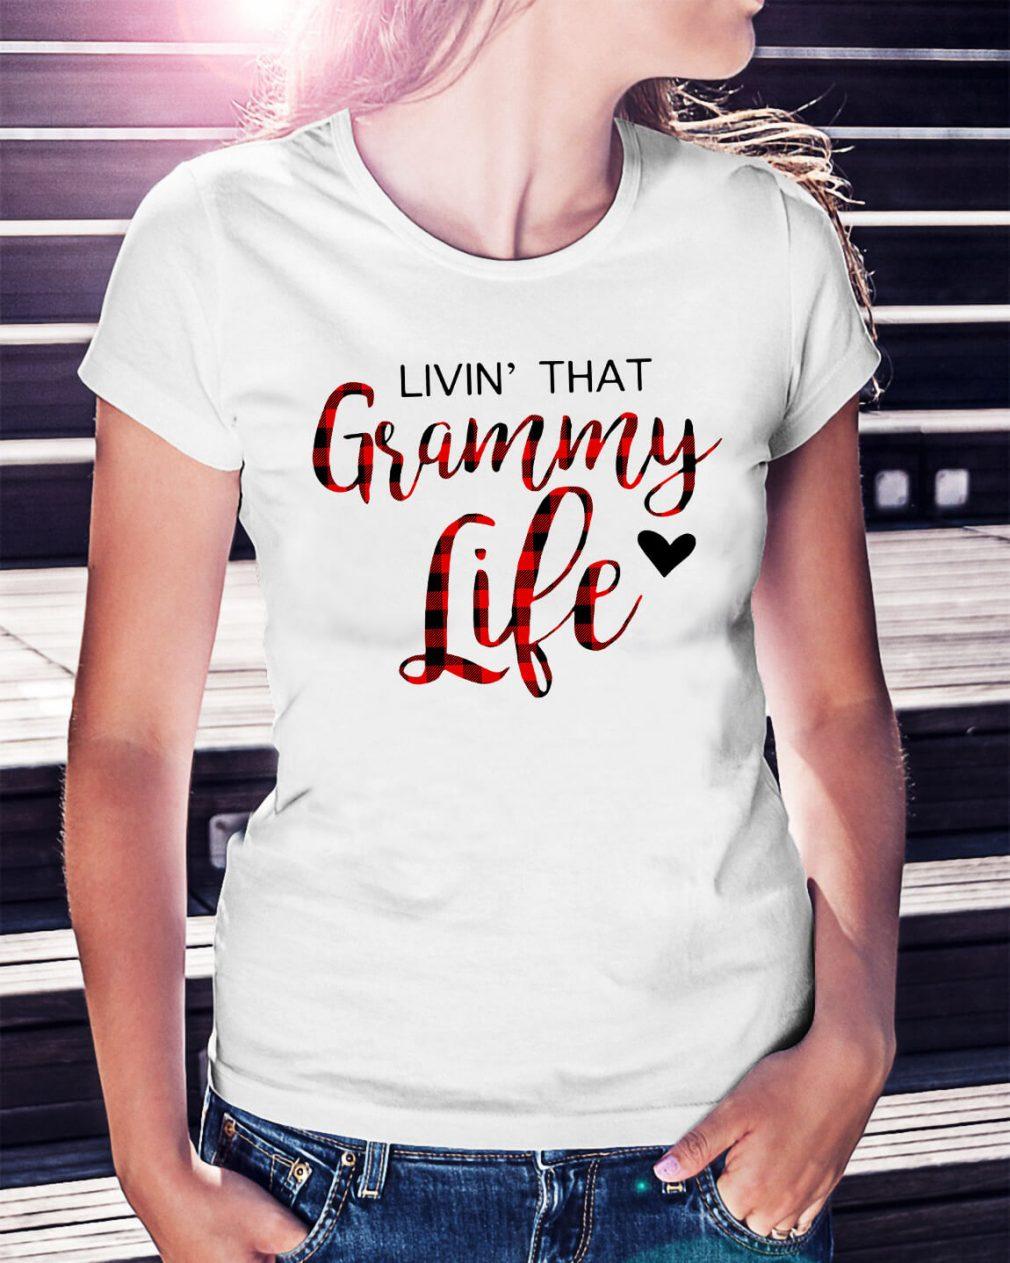 Livin' that grammy life Ladies Tee